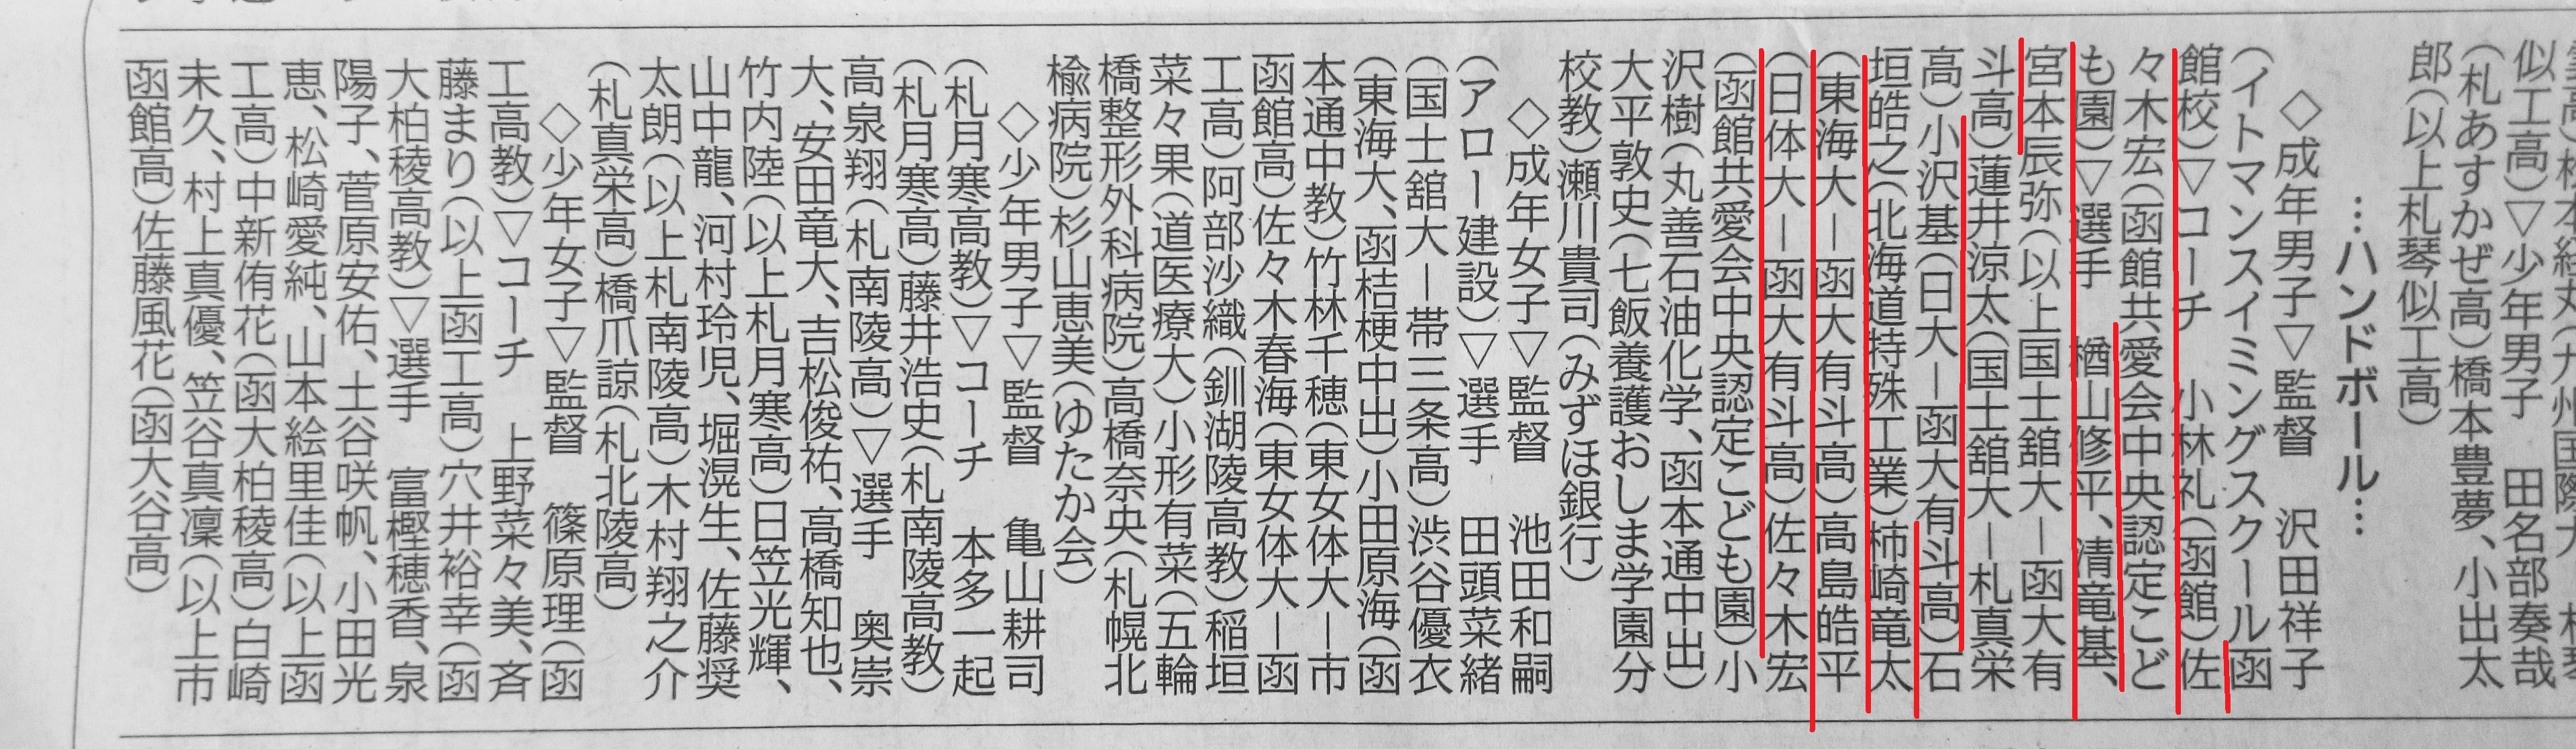 2017 kokutai member4